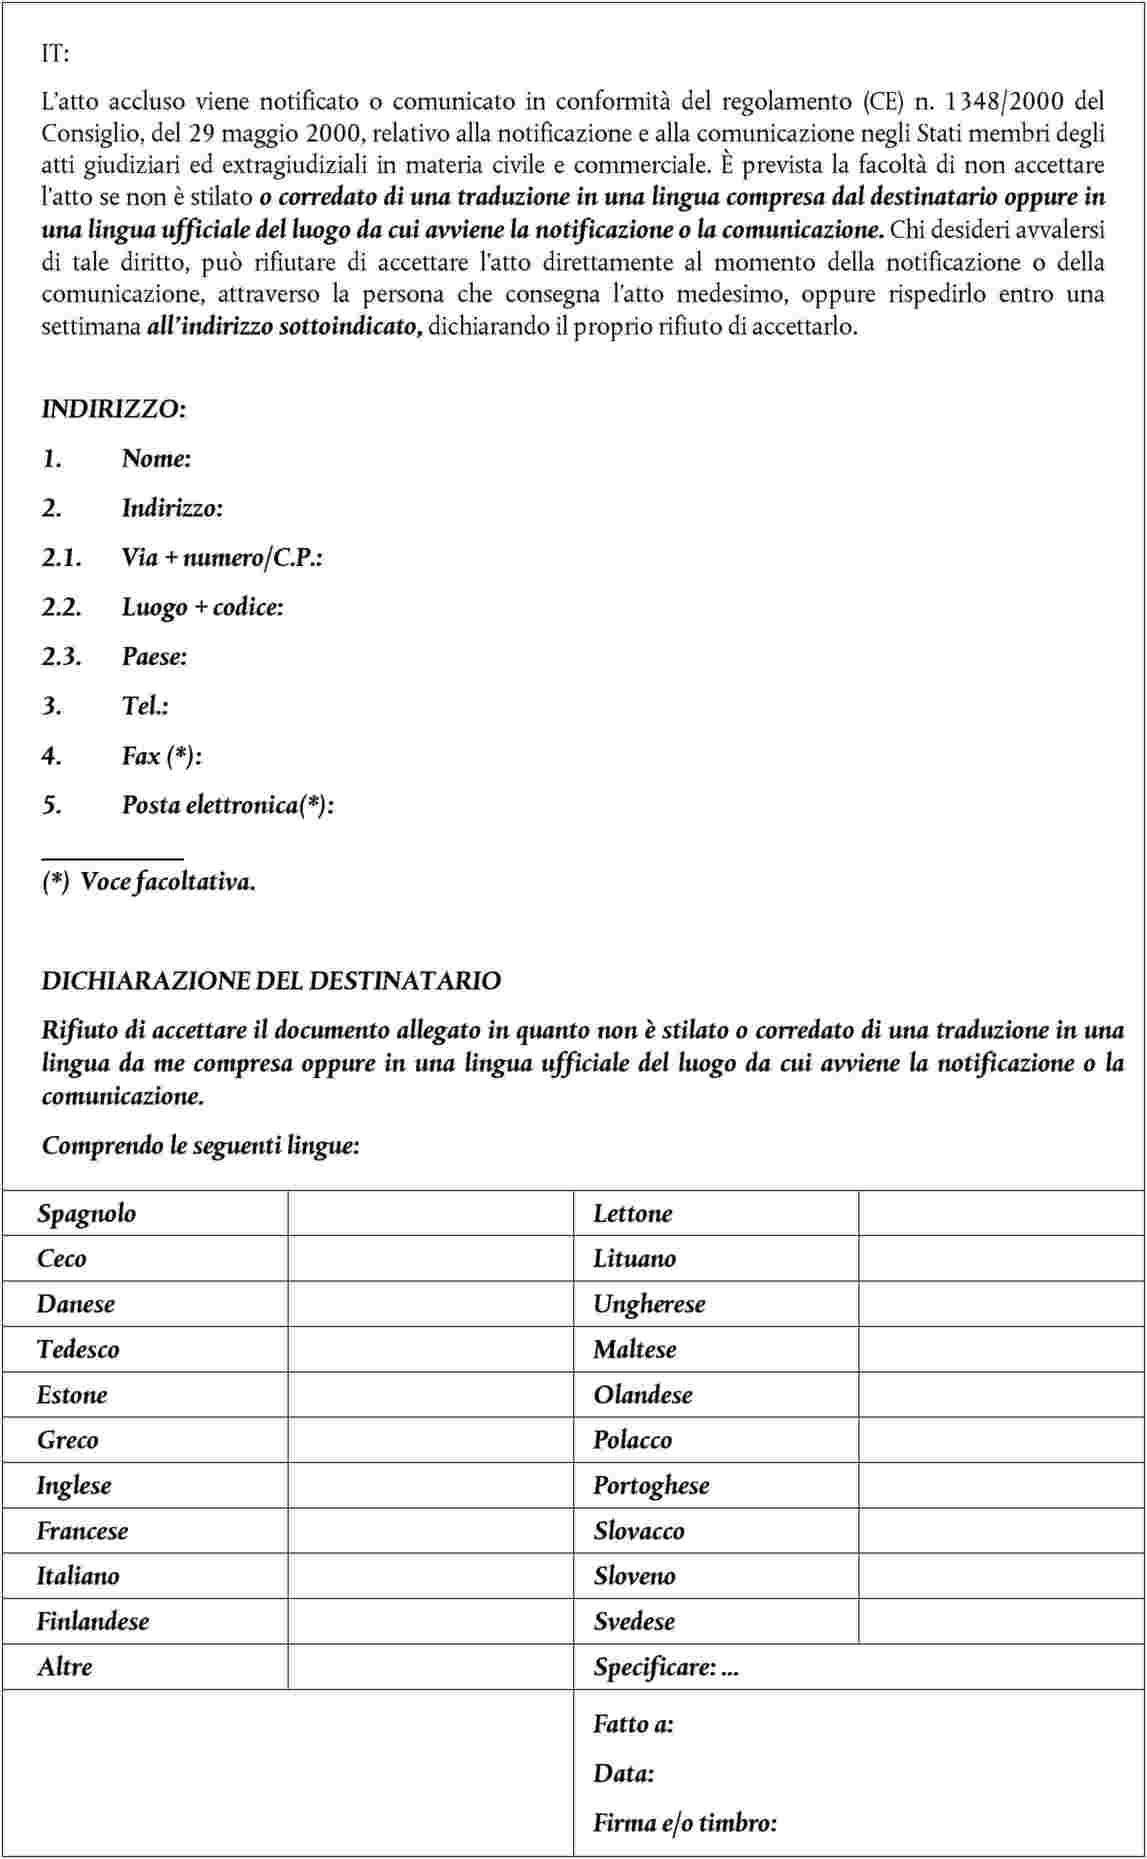 Haken-up traduzione italiano